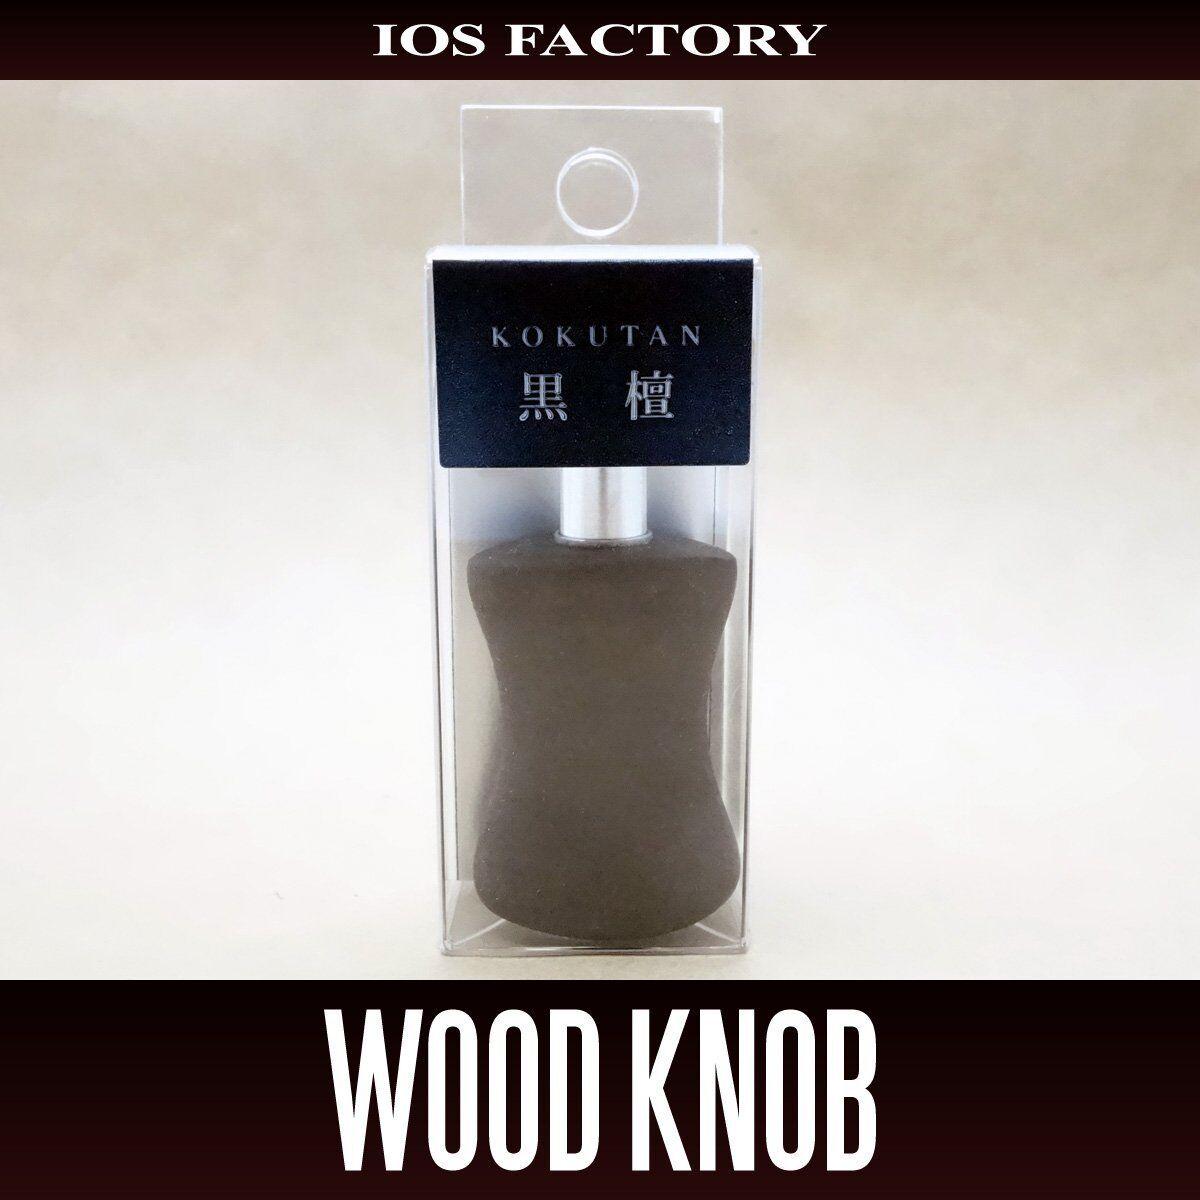 IOS FACTORY PREMIUM WOOD KNOB TYPE-B Ebony 黒檀